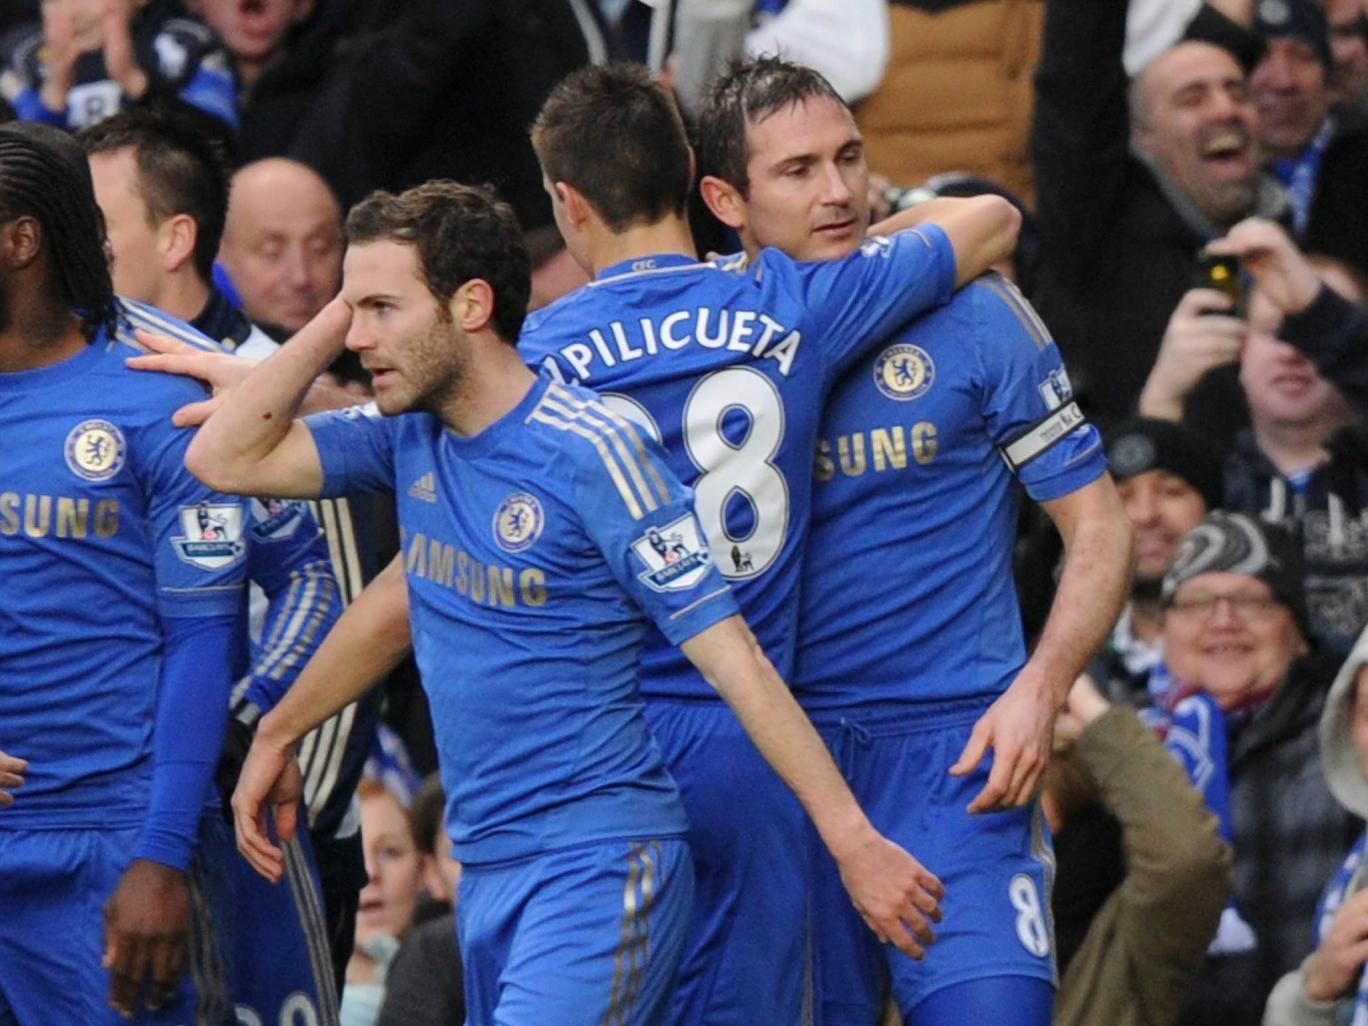 Frank Lampard celebrates his goal for Chelsea against West Ham